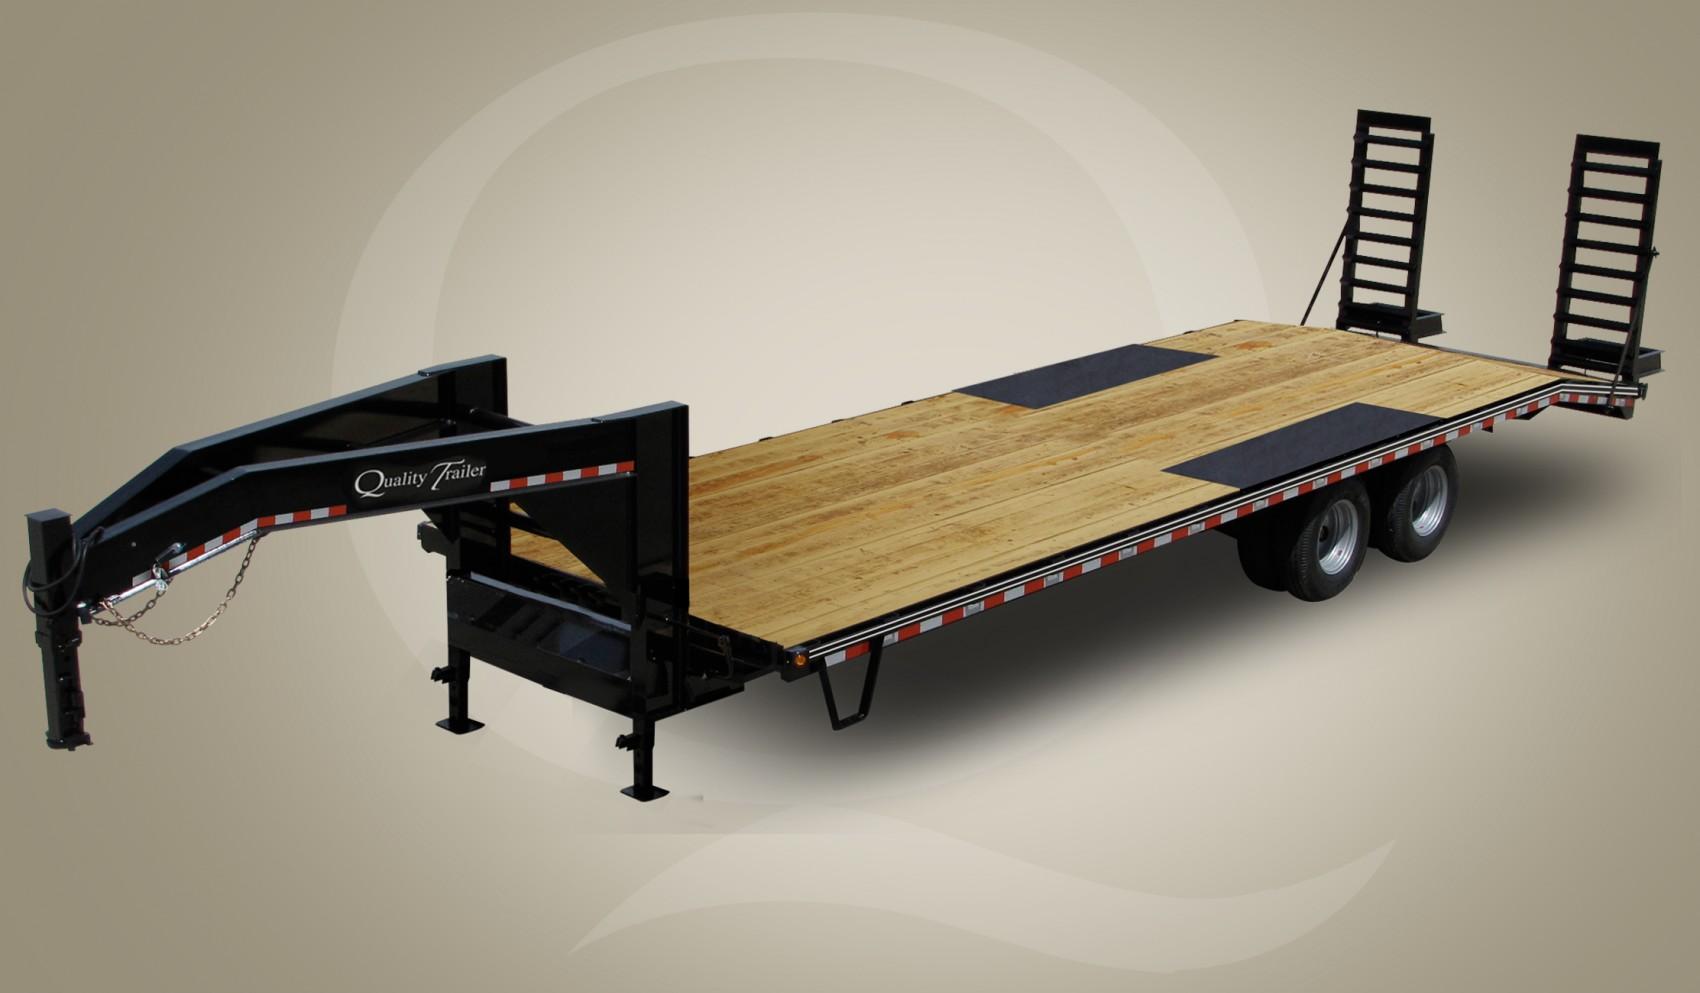 Skid Steer Wood Floor Gooseneck Trailer